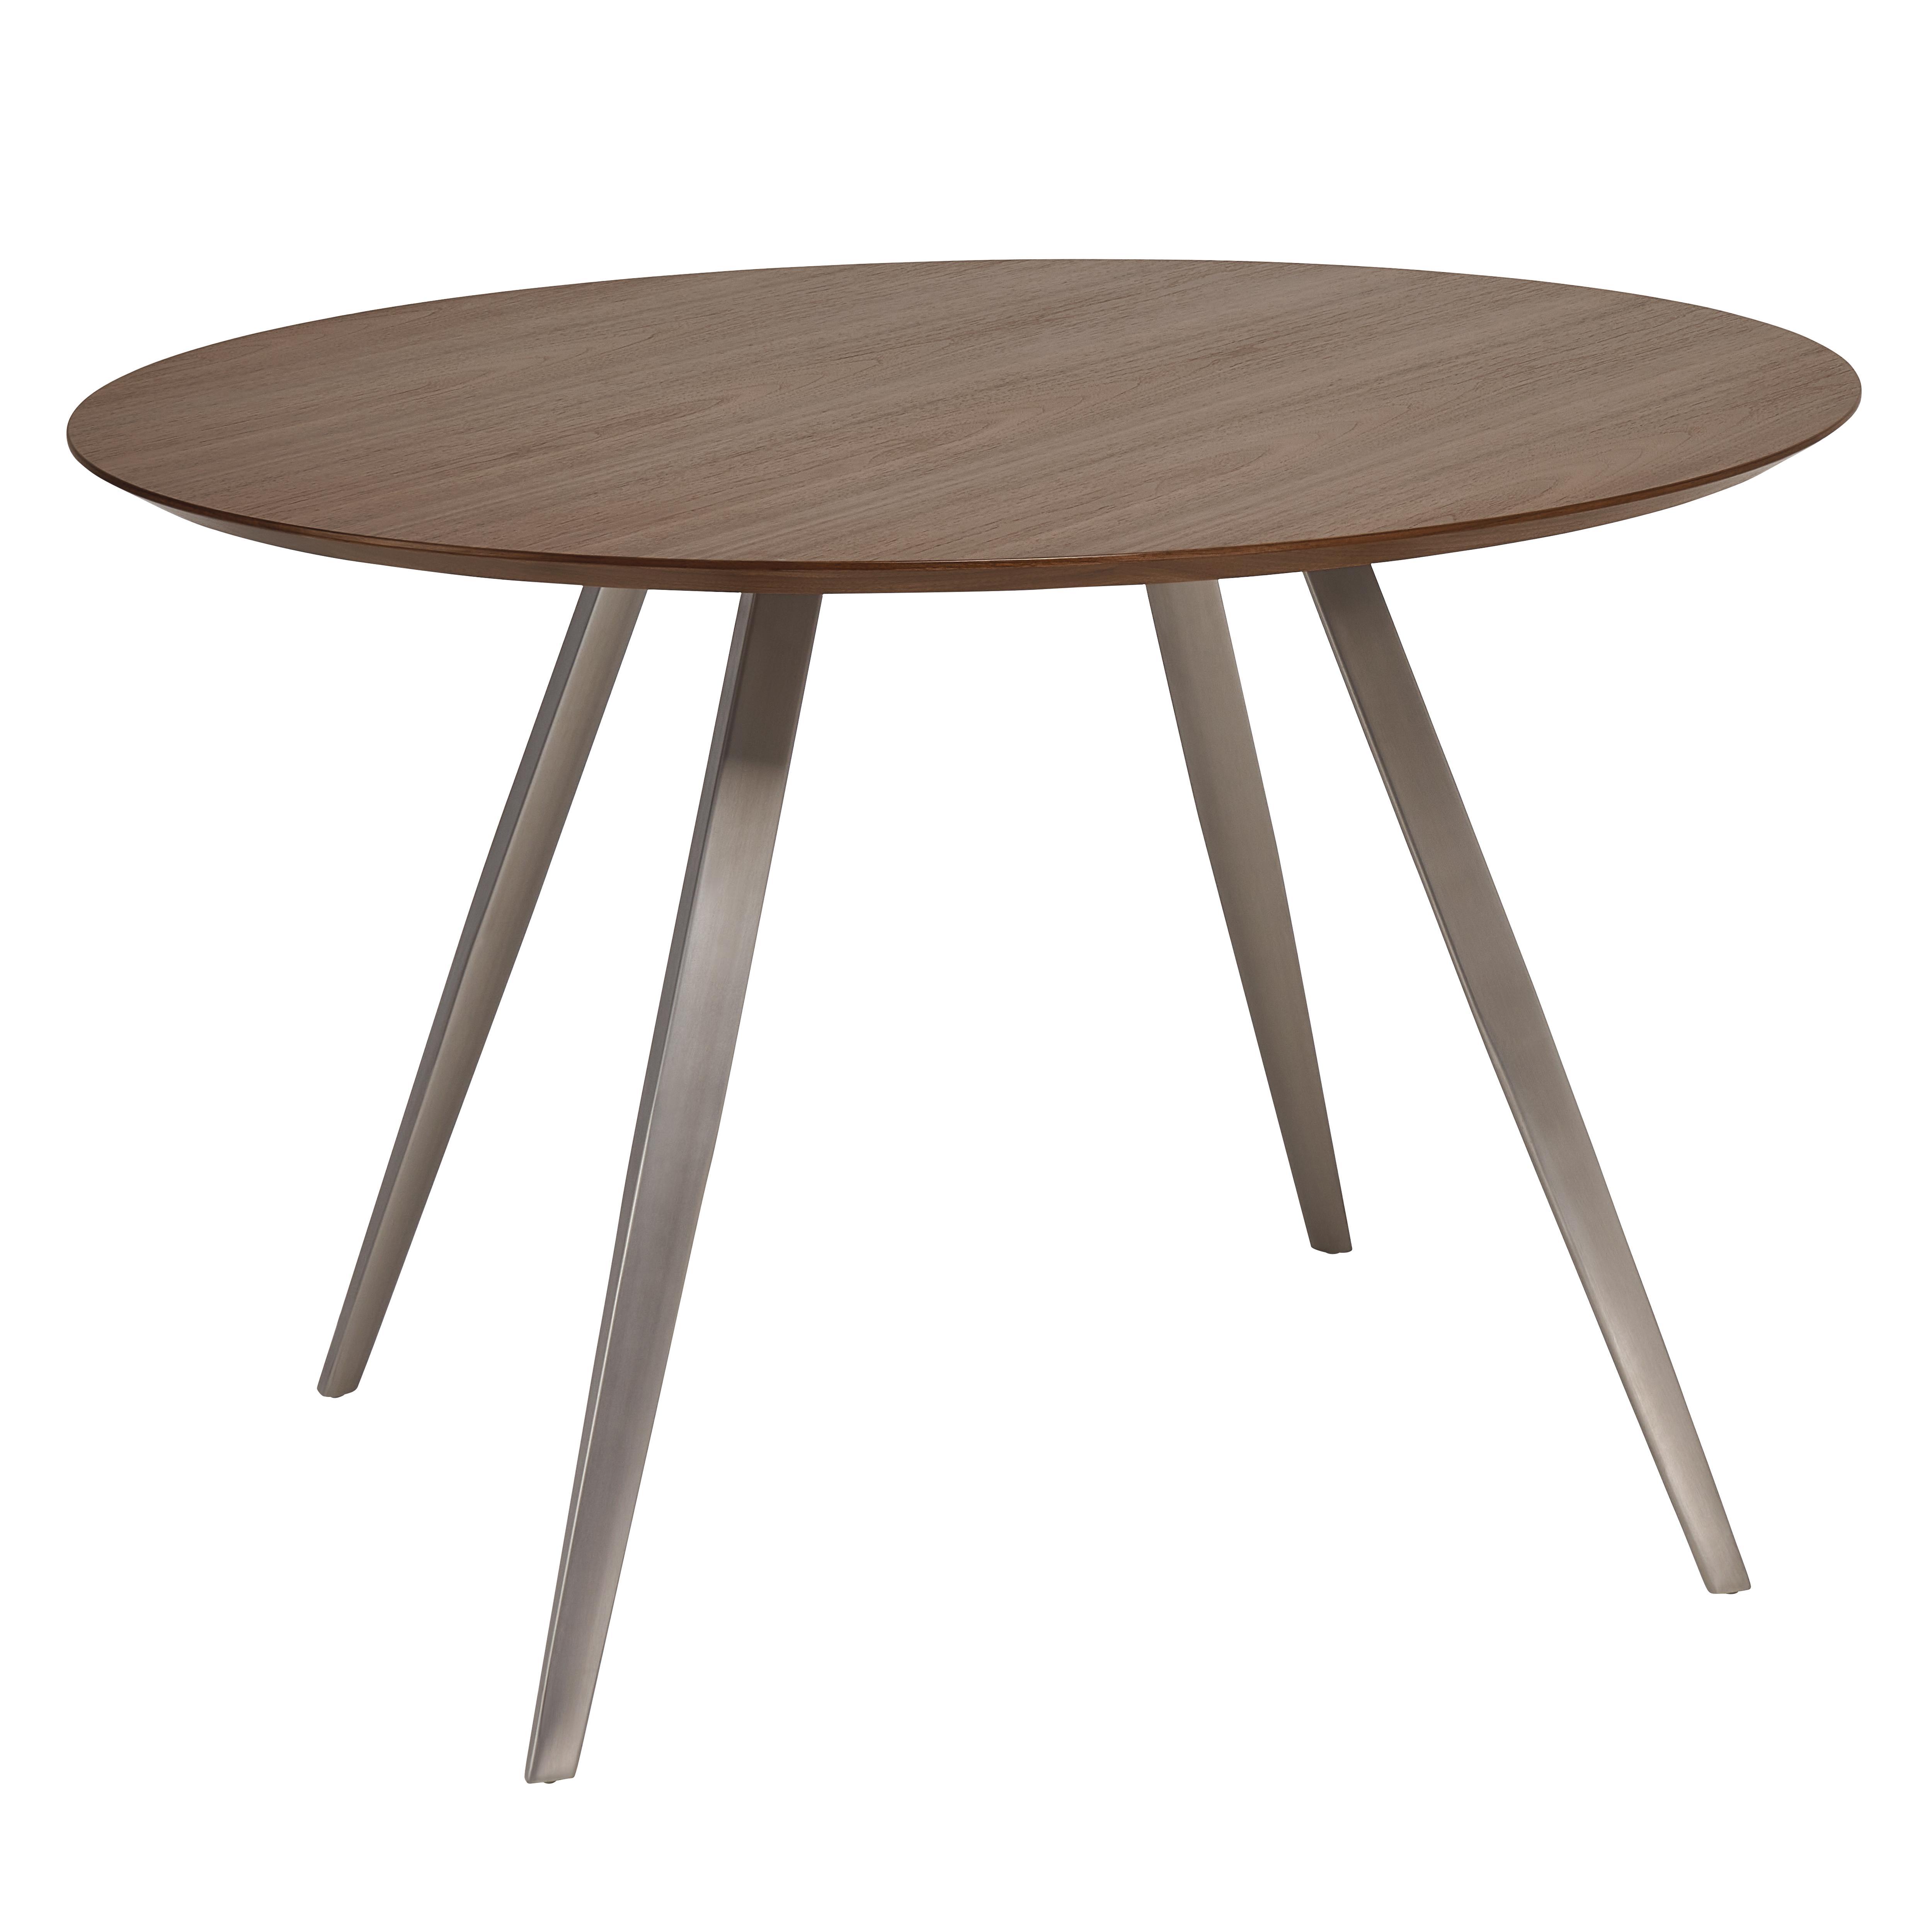 Passare round 4-6 seater dining table 120cm walnut